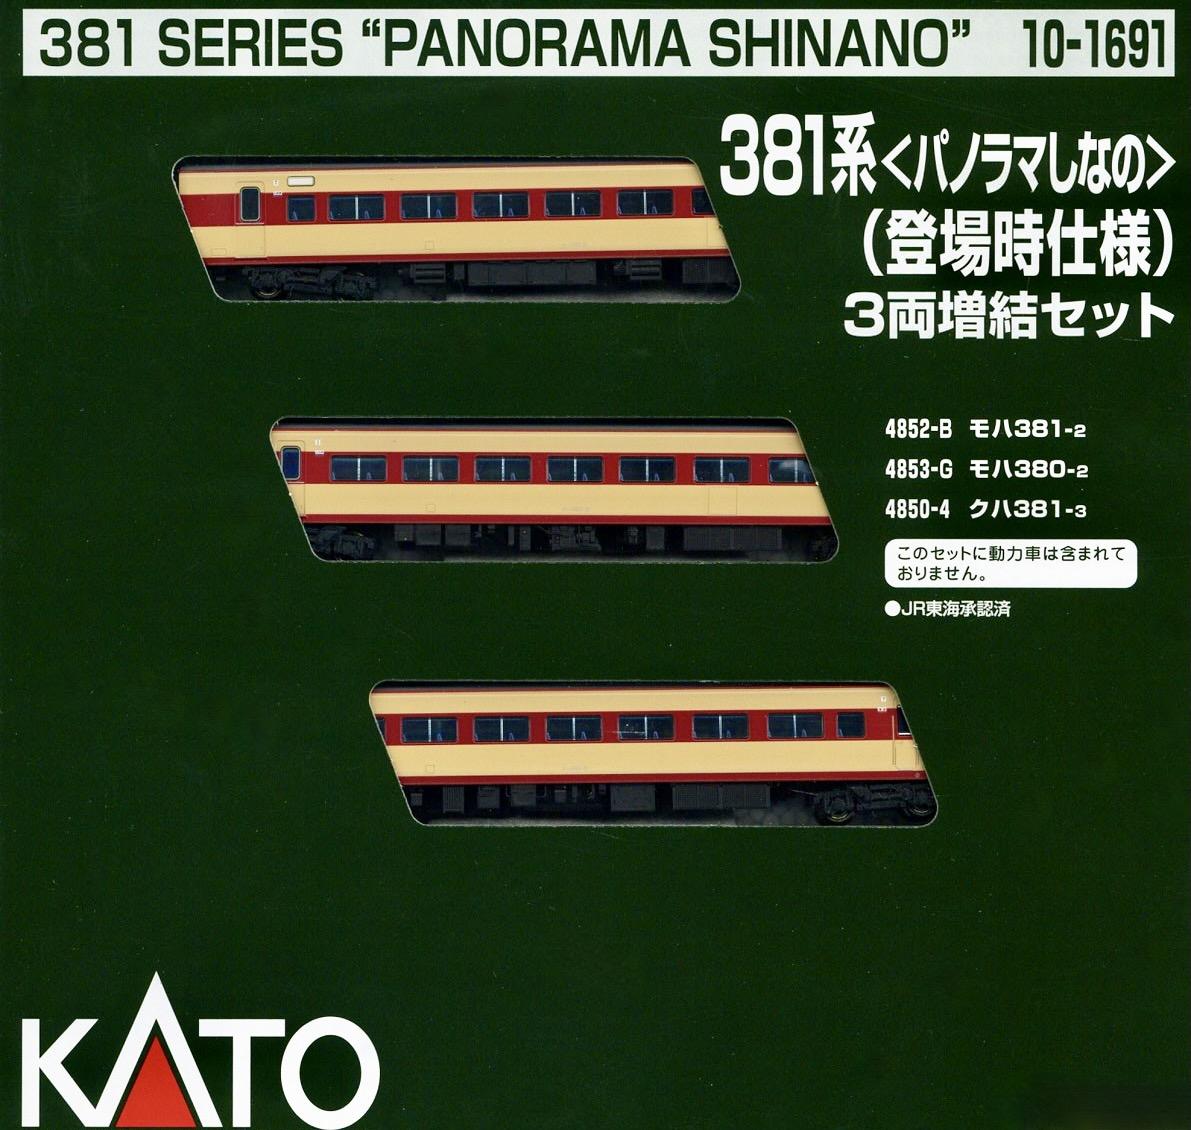 N Scale - Kato - 10-1691 - Passenger Train, Electric, Series 381 - Japan Railways Central - 3 Car Add-On Set